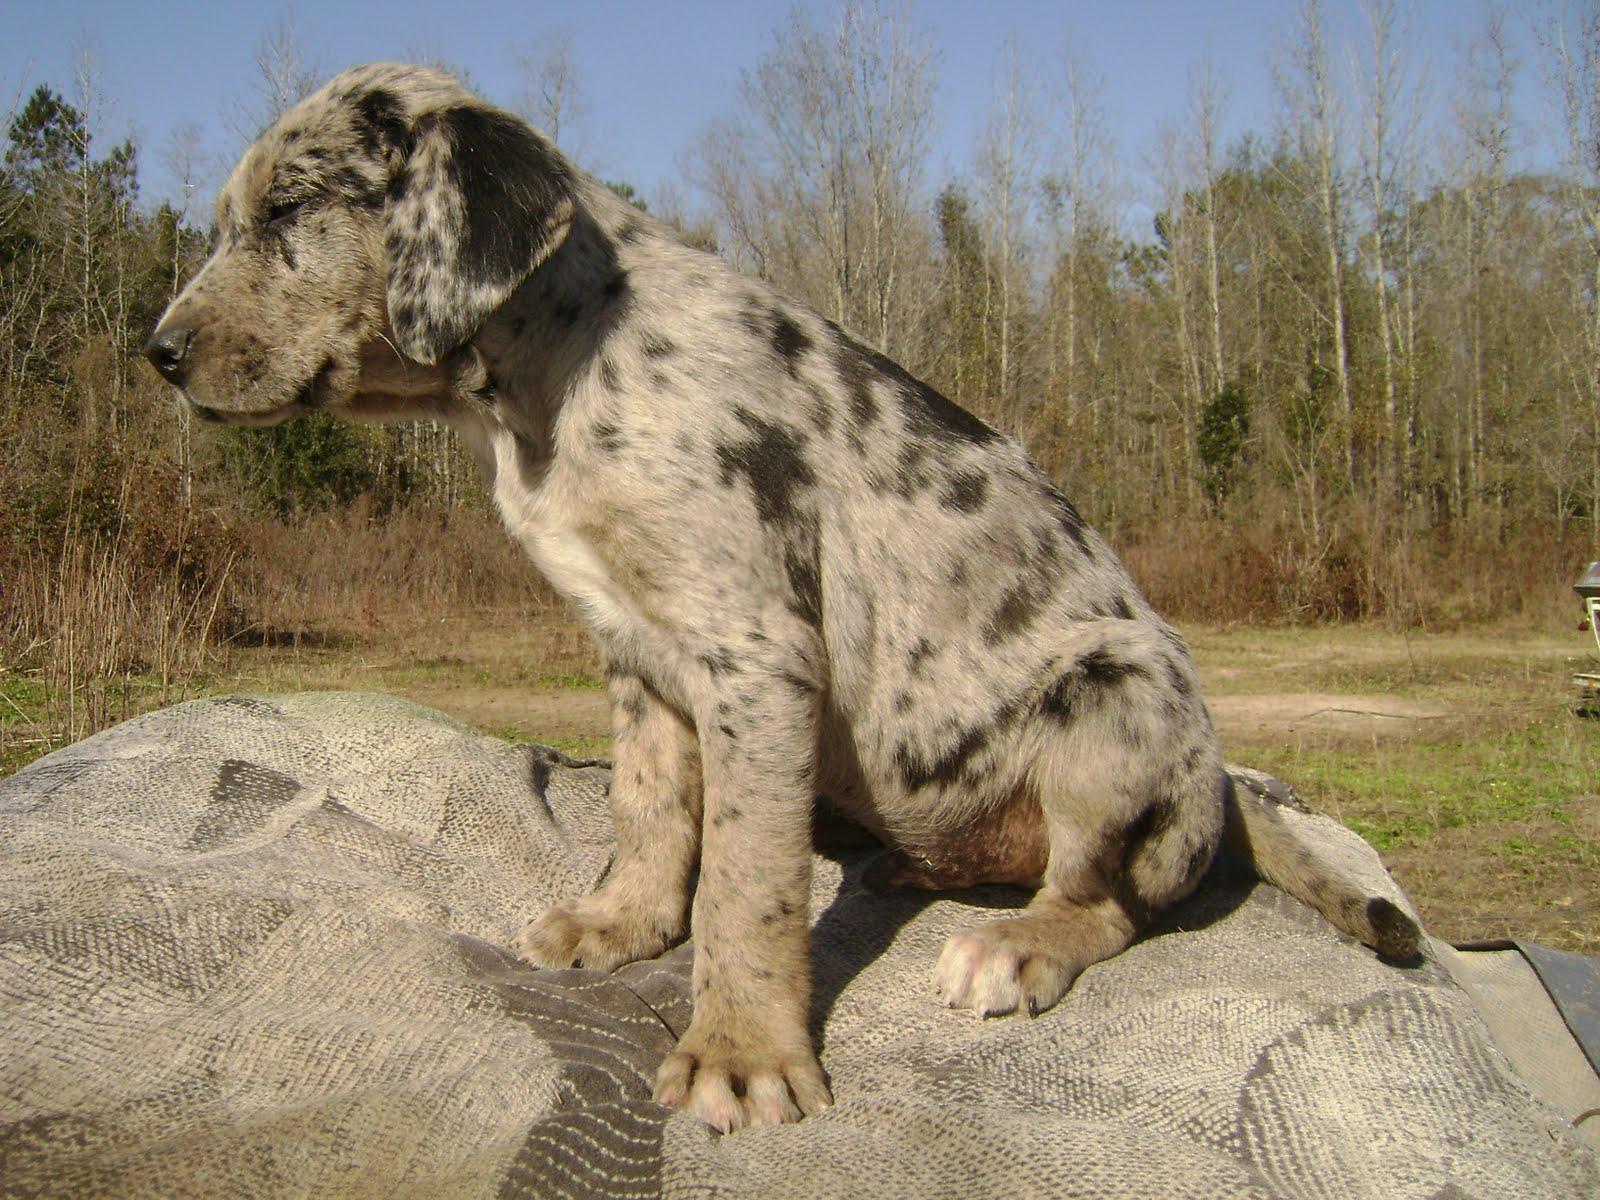 Catahoula Cur Dog: Catahoula Datahoula Dur Dog Picnic Breed